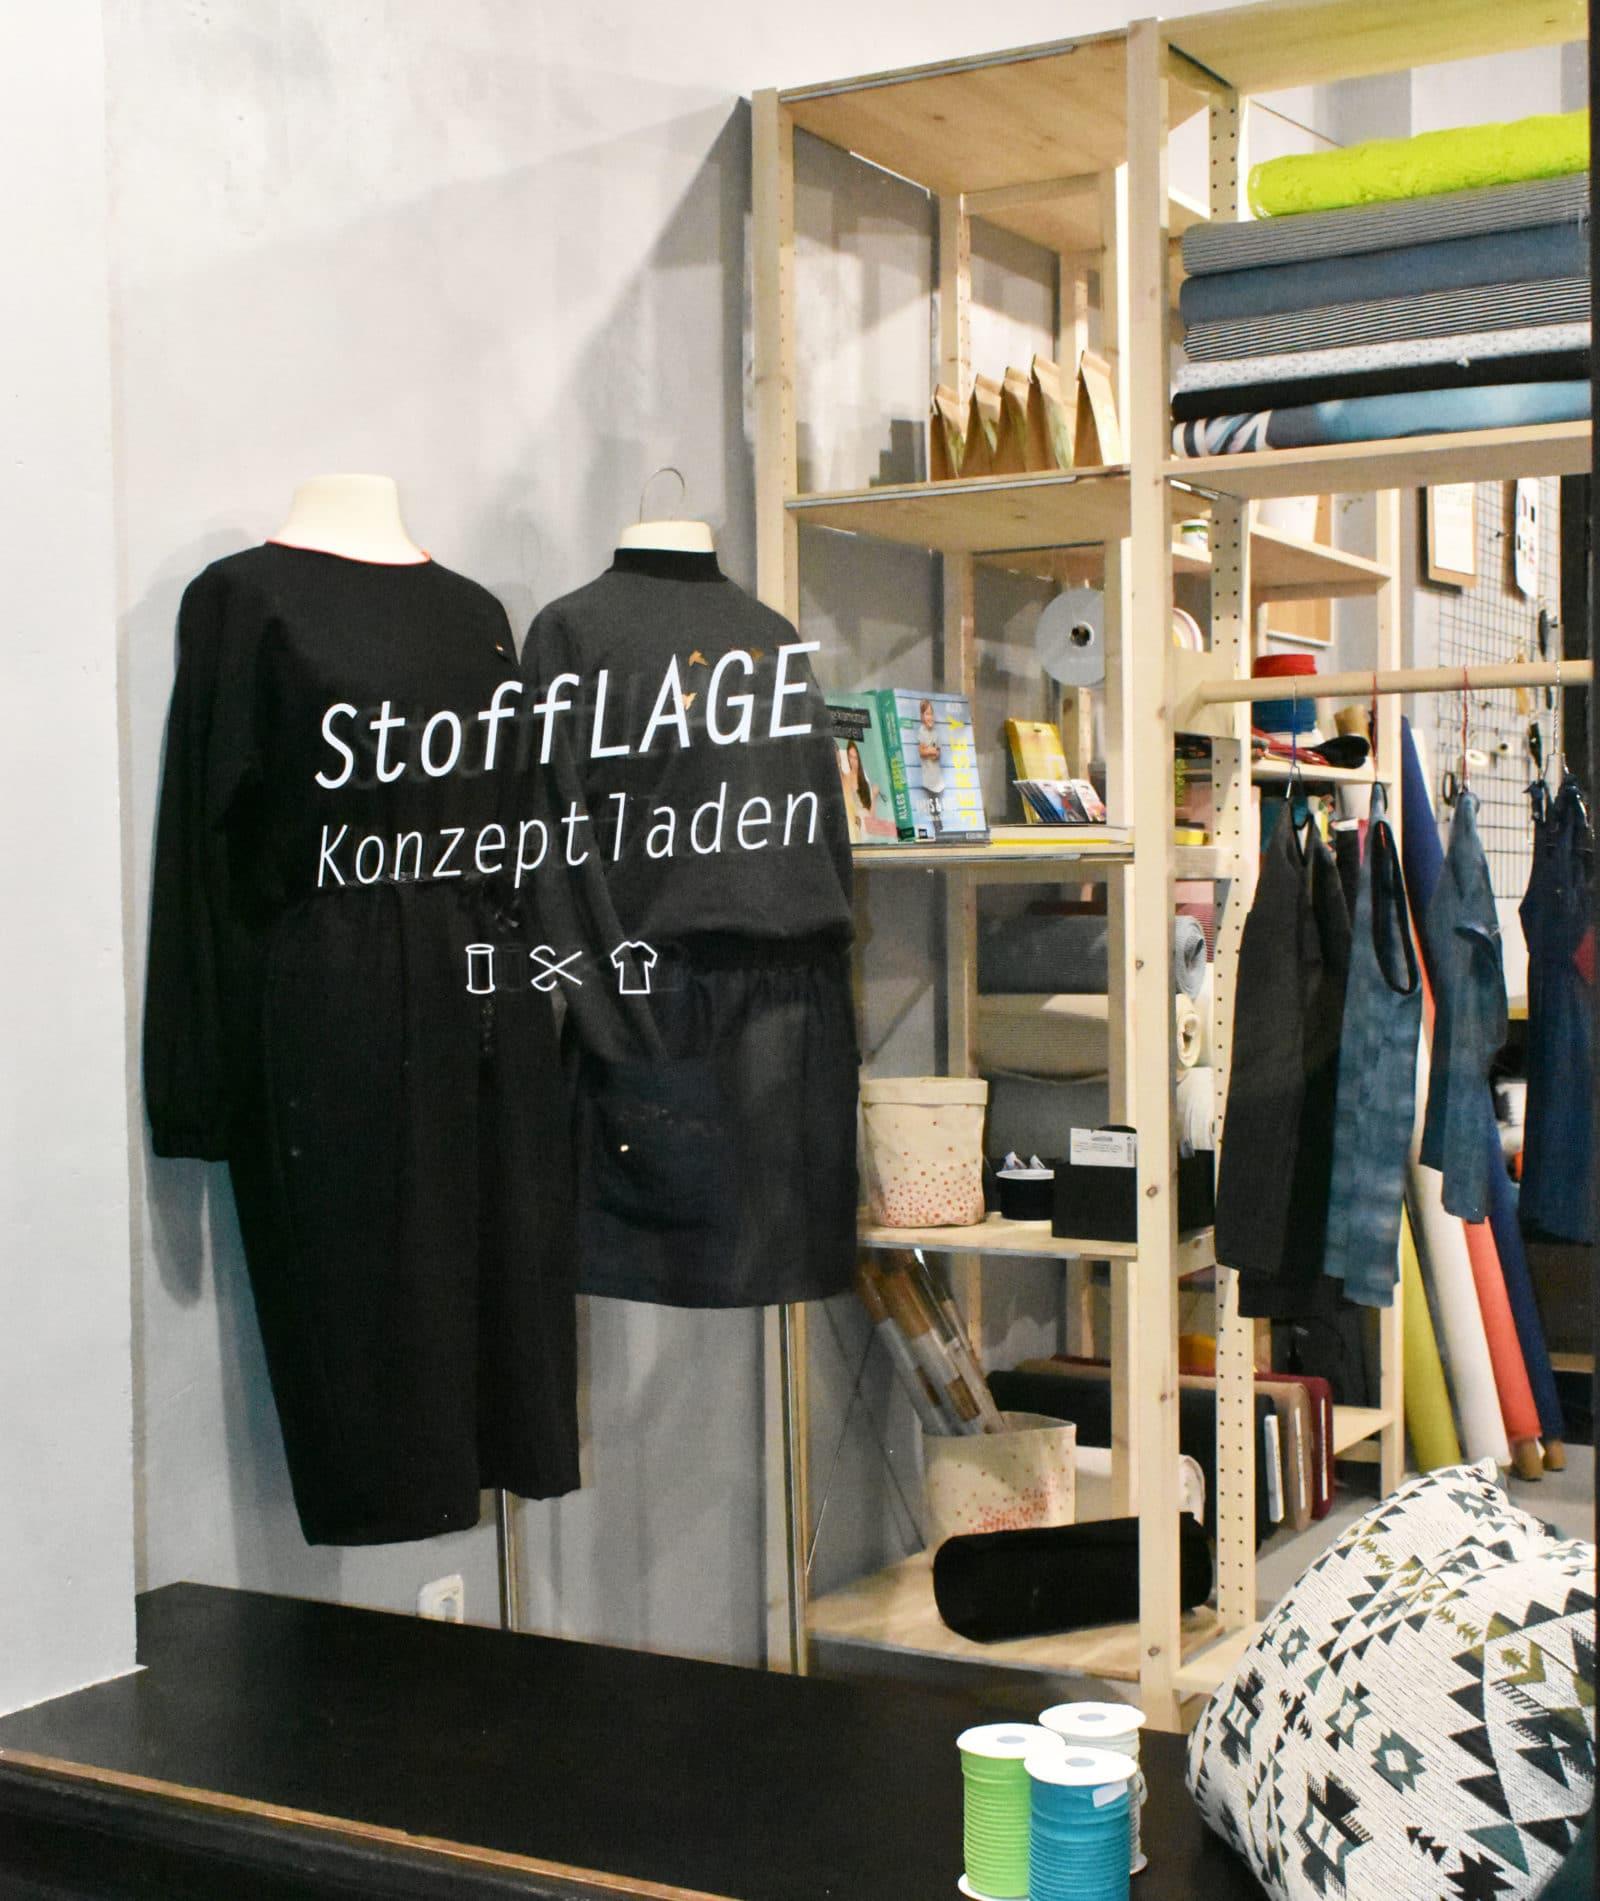 StoffLAGE Konzeptladen - Geschäfte bei HANDMADE Kultur